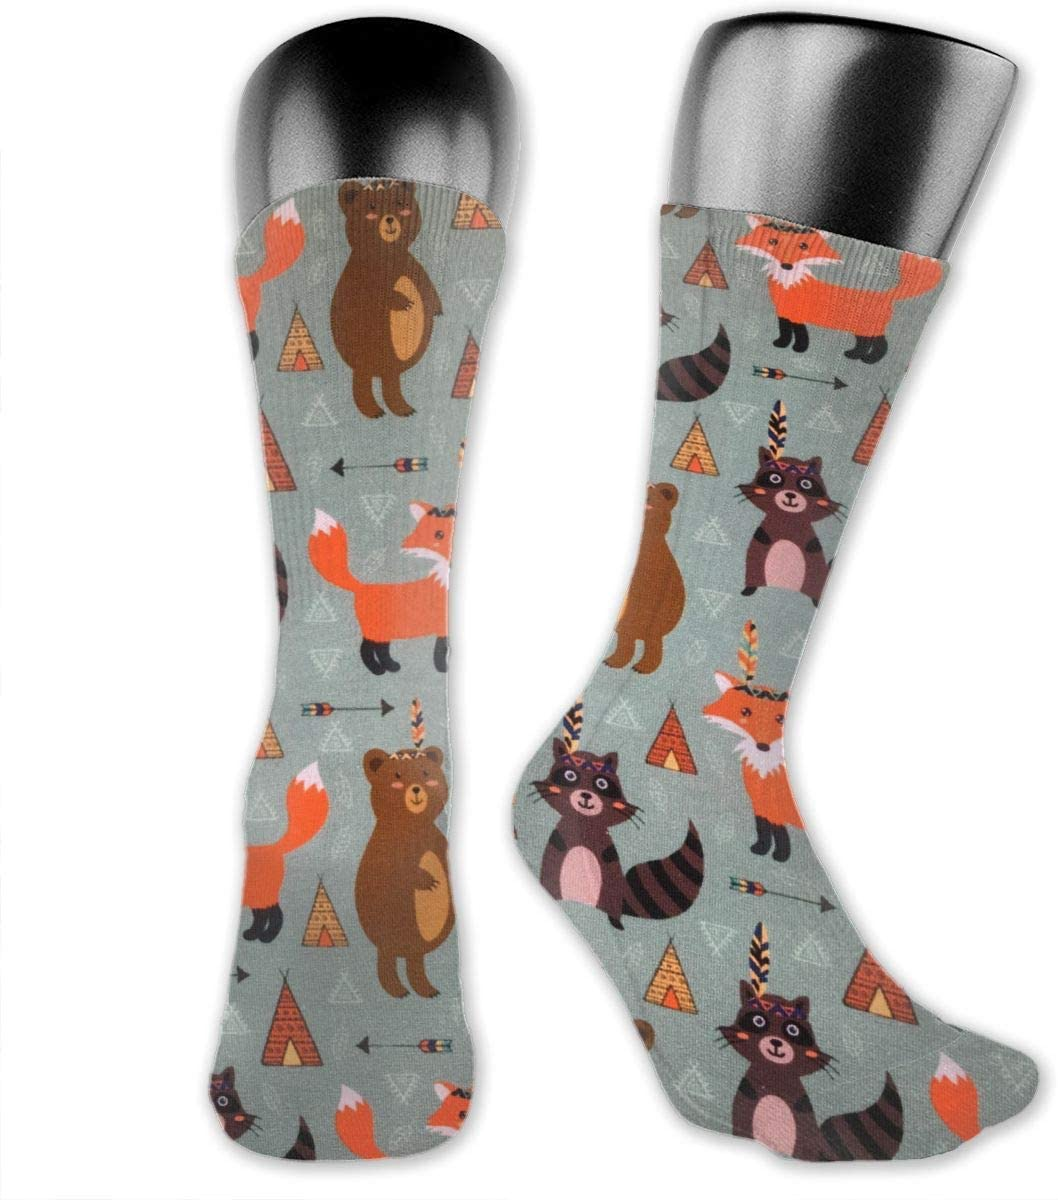 OLGCZM Cartoon Fox Bear Men Womens Thin High Ankle Casual Socks Fit Outdoor Hiking Trail